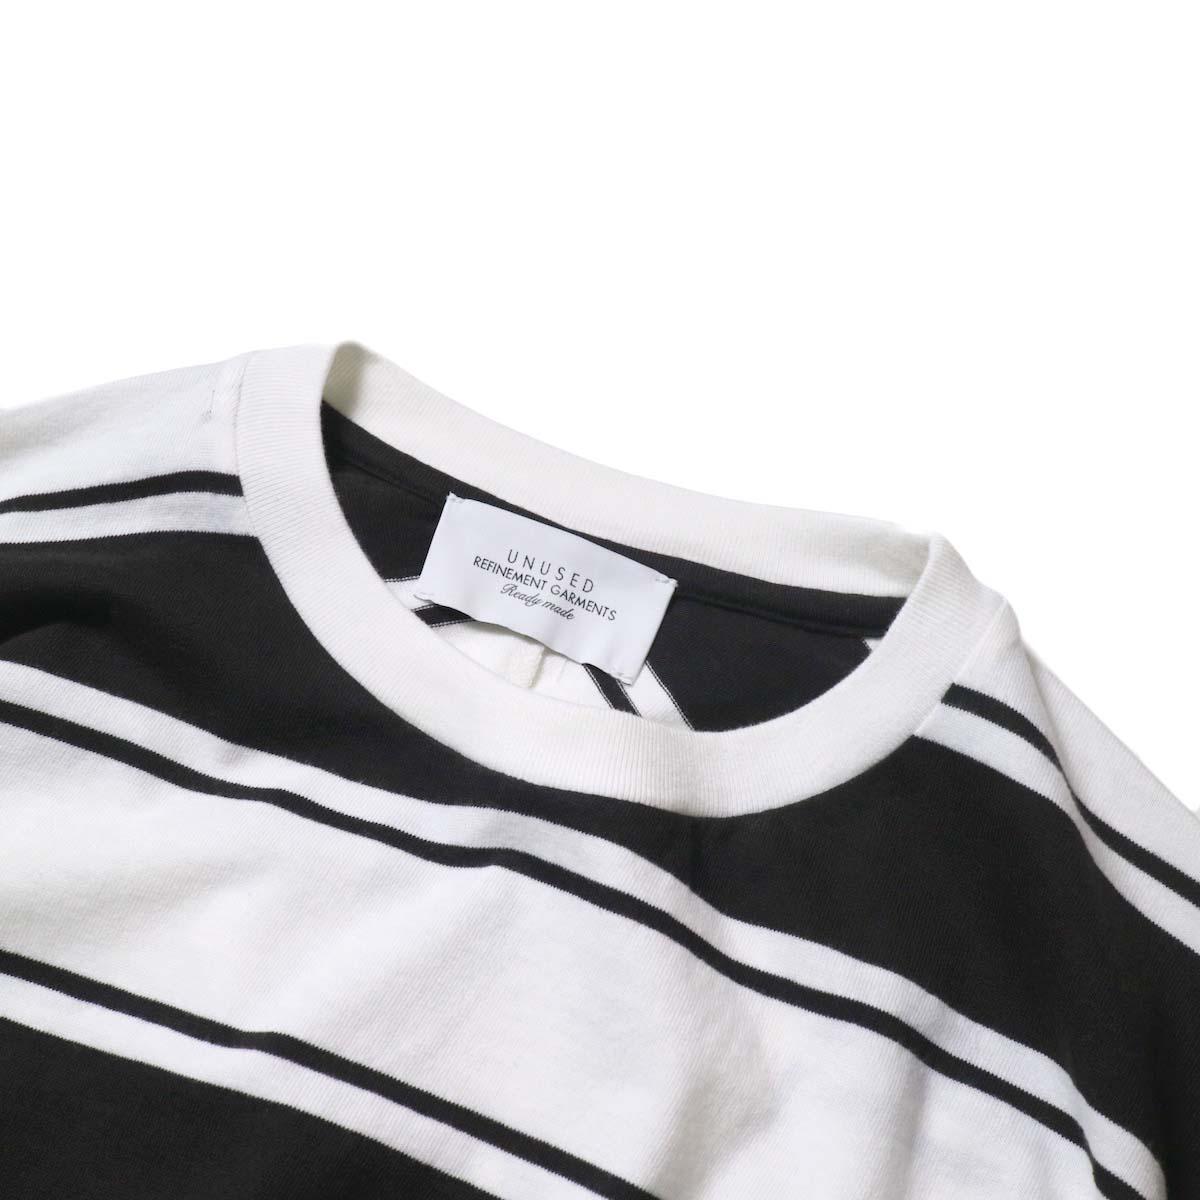 UNUSED / US1951 Dolman sleeve Short sleeve t-shirt (White×Black)ネック